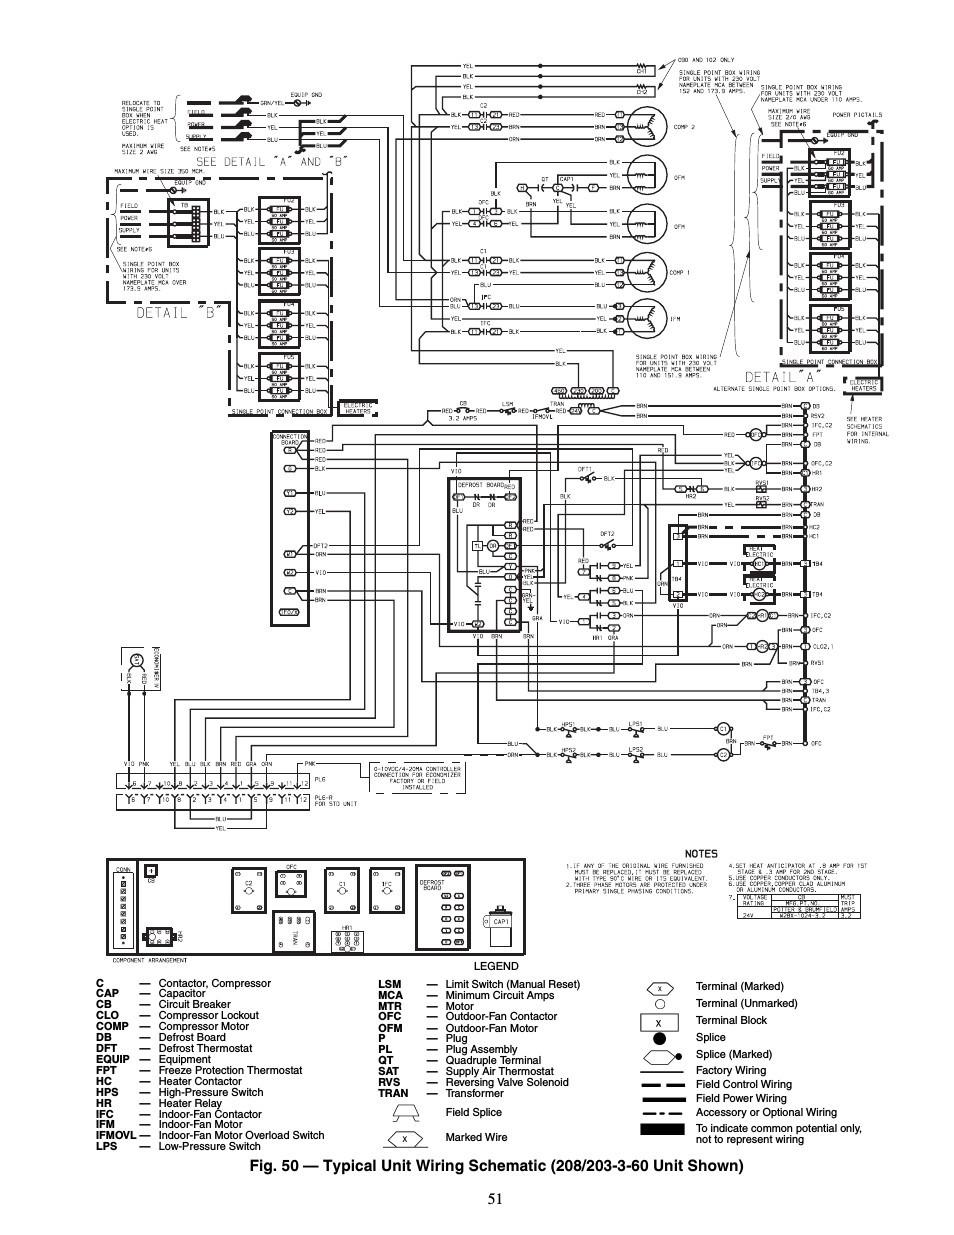 [OT_3687] Lockout Relay Wiring Diagram Wiring Diagram